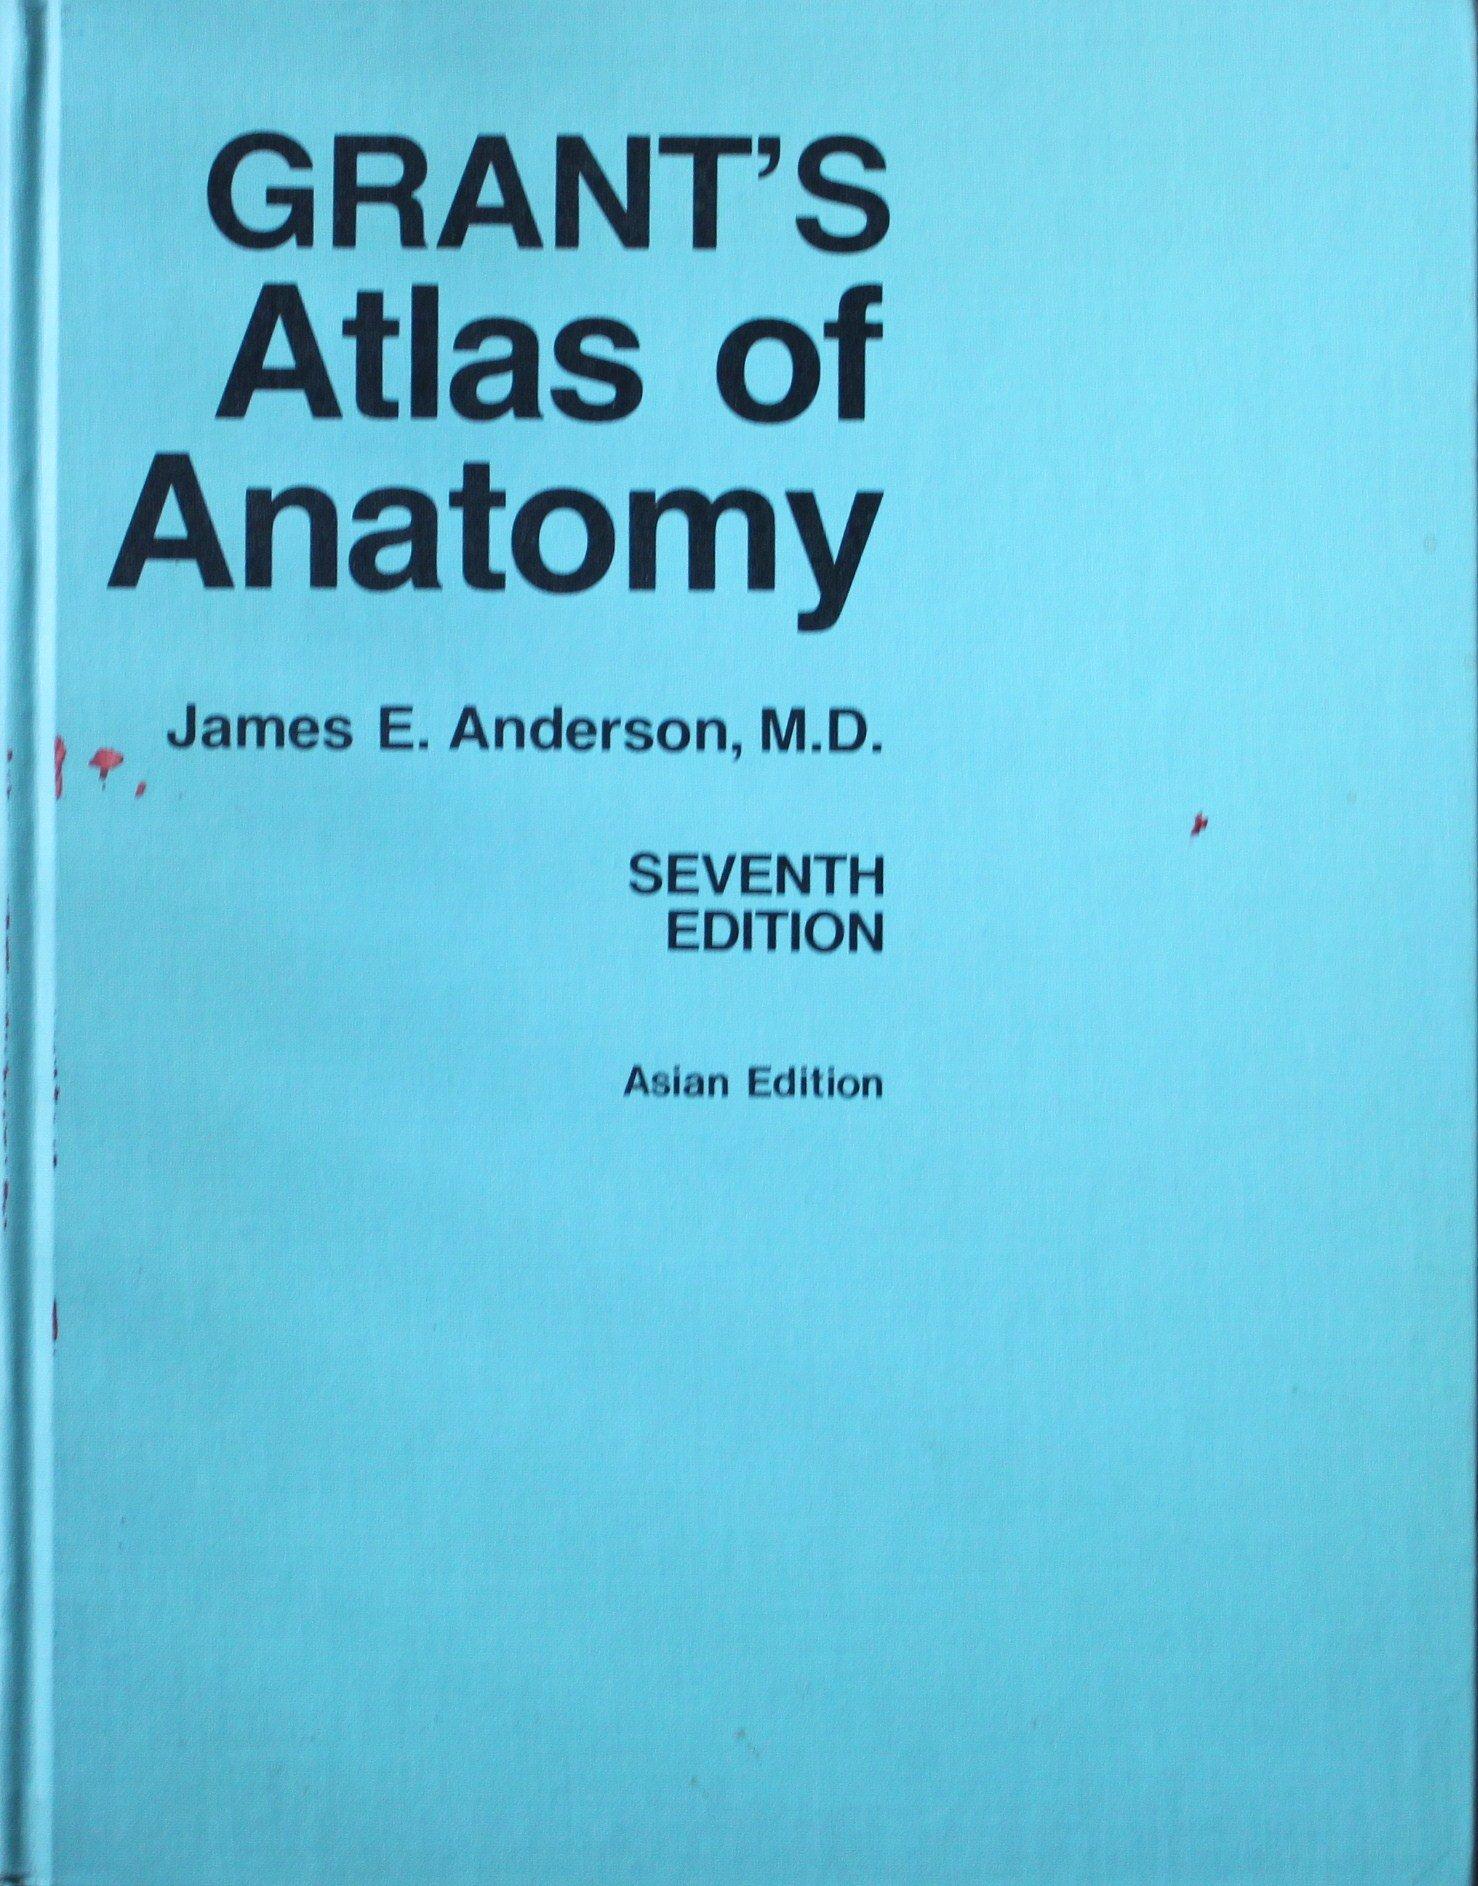 Grant\'s Atlas of Anatomy: ANDERSON: 9780683002126: Amazon.com: Books